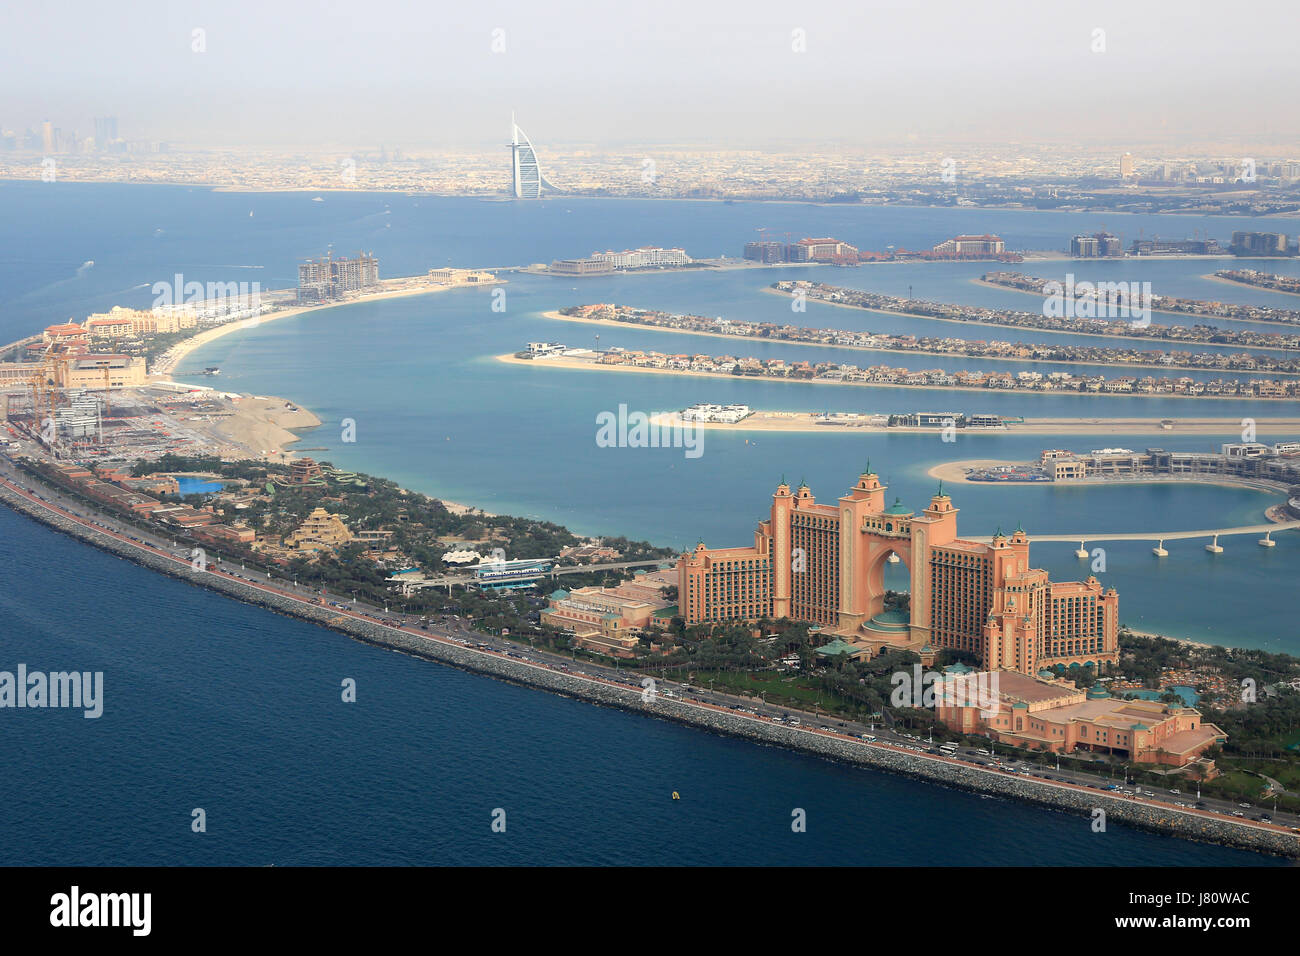 Dubai The Palm Insel Atlantis Hotel Burj Al Arab Luftbild Fotografie Vereinigte Arabische Emirate Stockbild